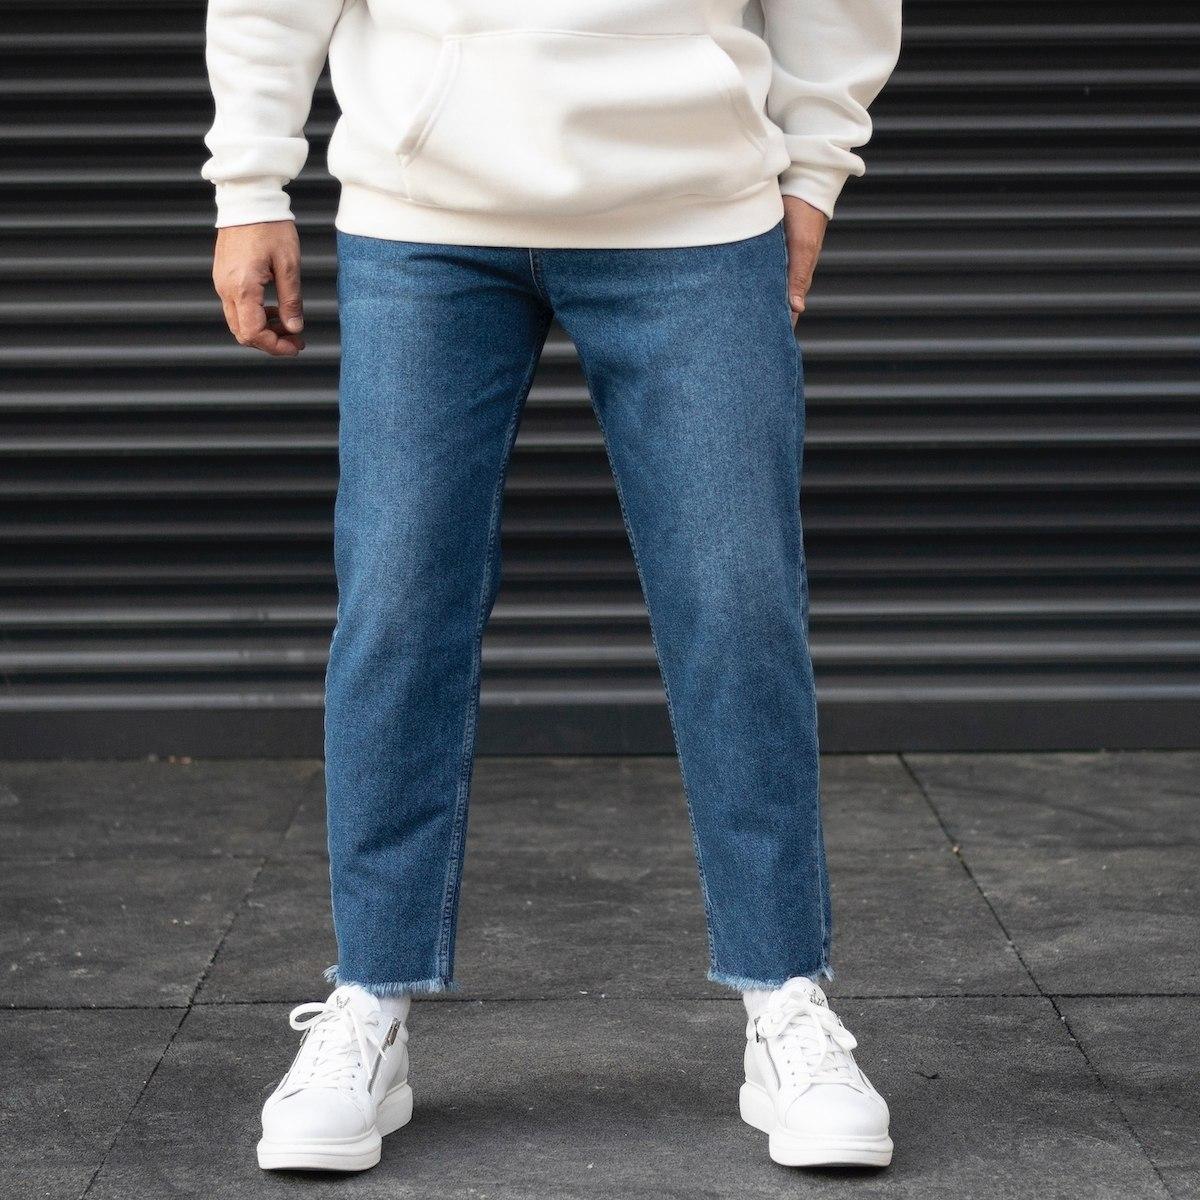 Men's Boyfriend Basic Jeans With Fringed Leg In Blue